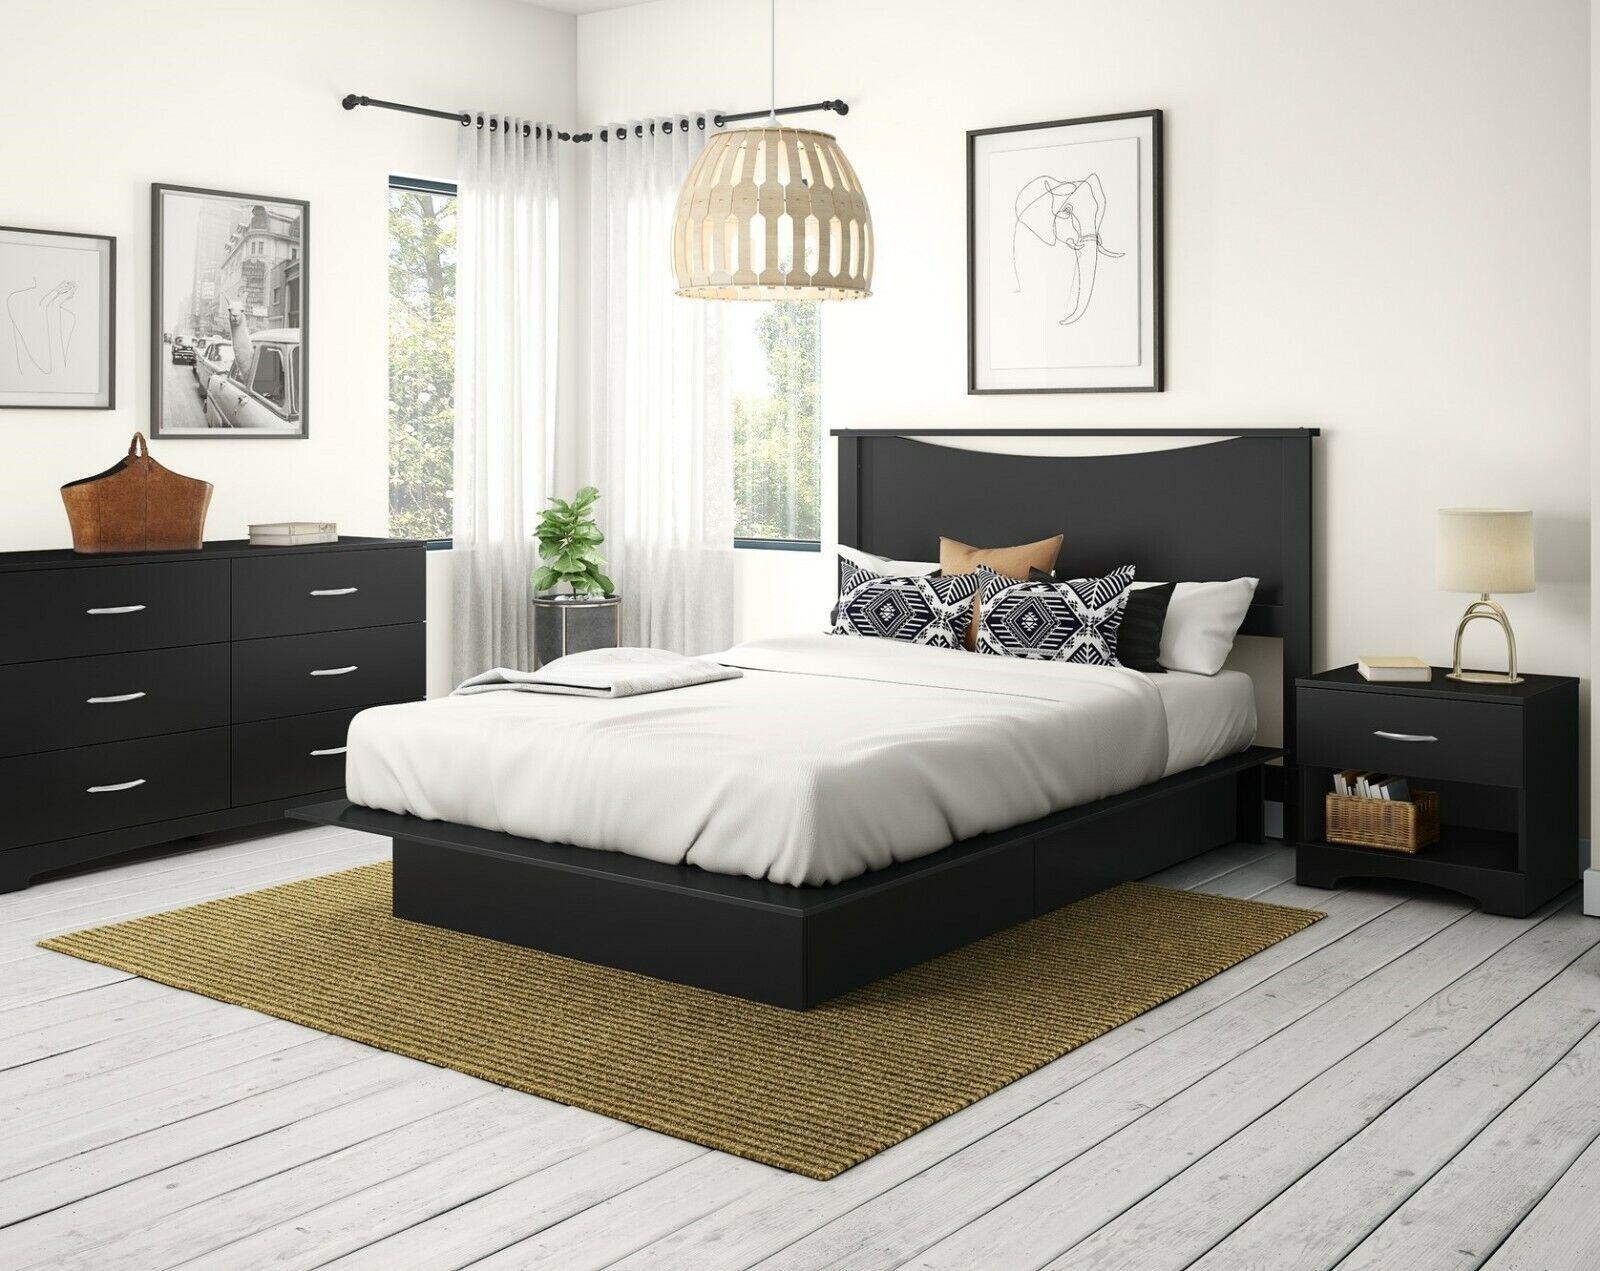 Ashley Furniture B697 Porter Queen King Storage Bed Frame 4